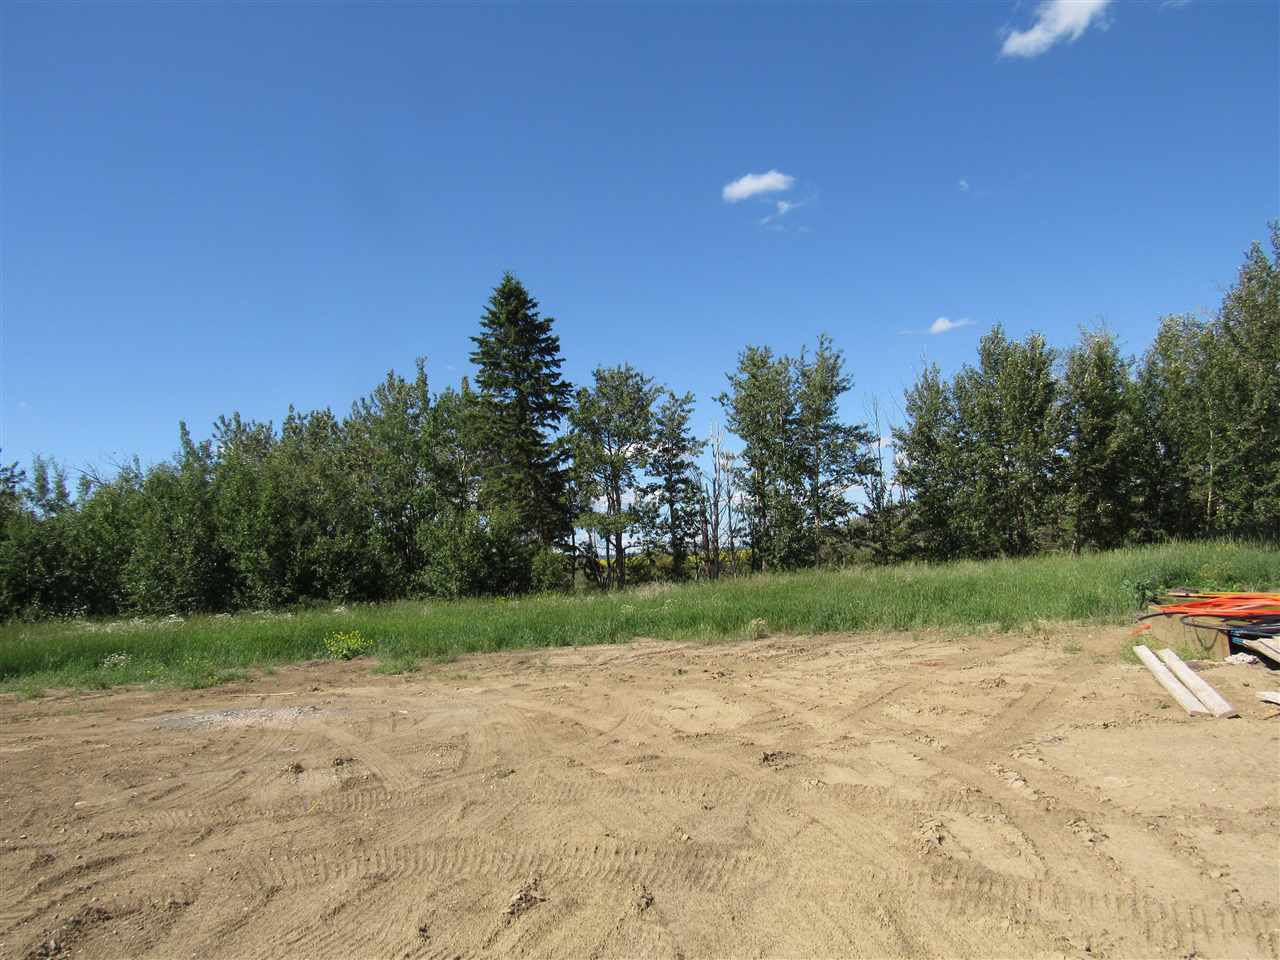 Main Photo: 24 Sun Meadows Close: Stony Plain Vacant Lot for sale : MLS®# E4175593